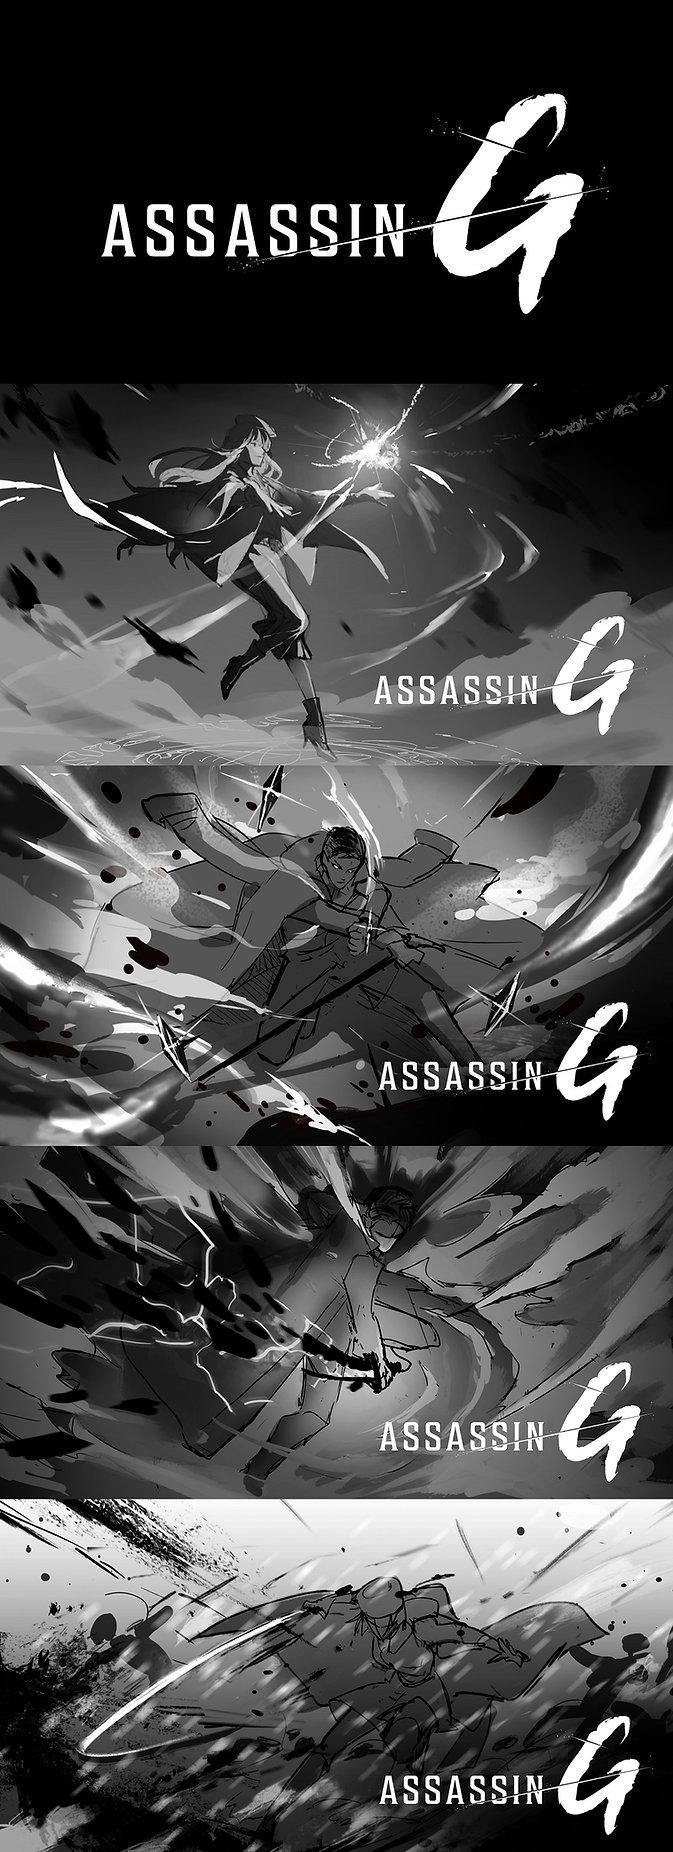 assassin_g_-_website_-_18th_september_20